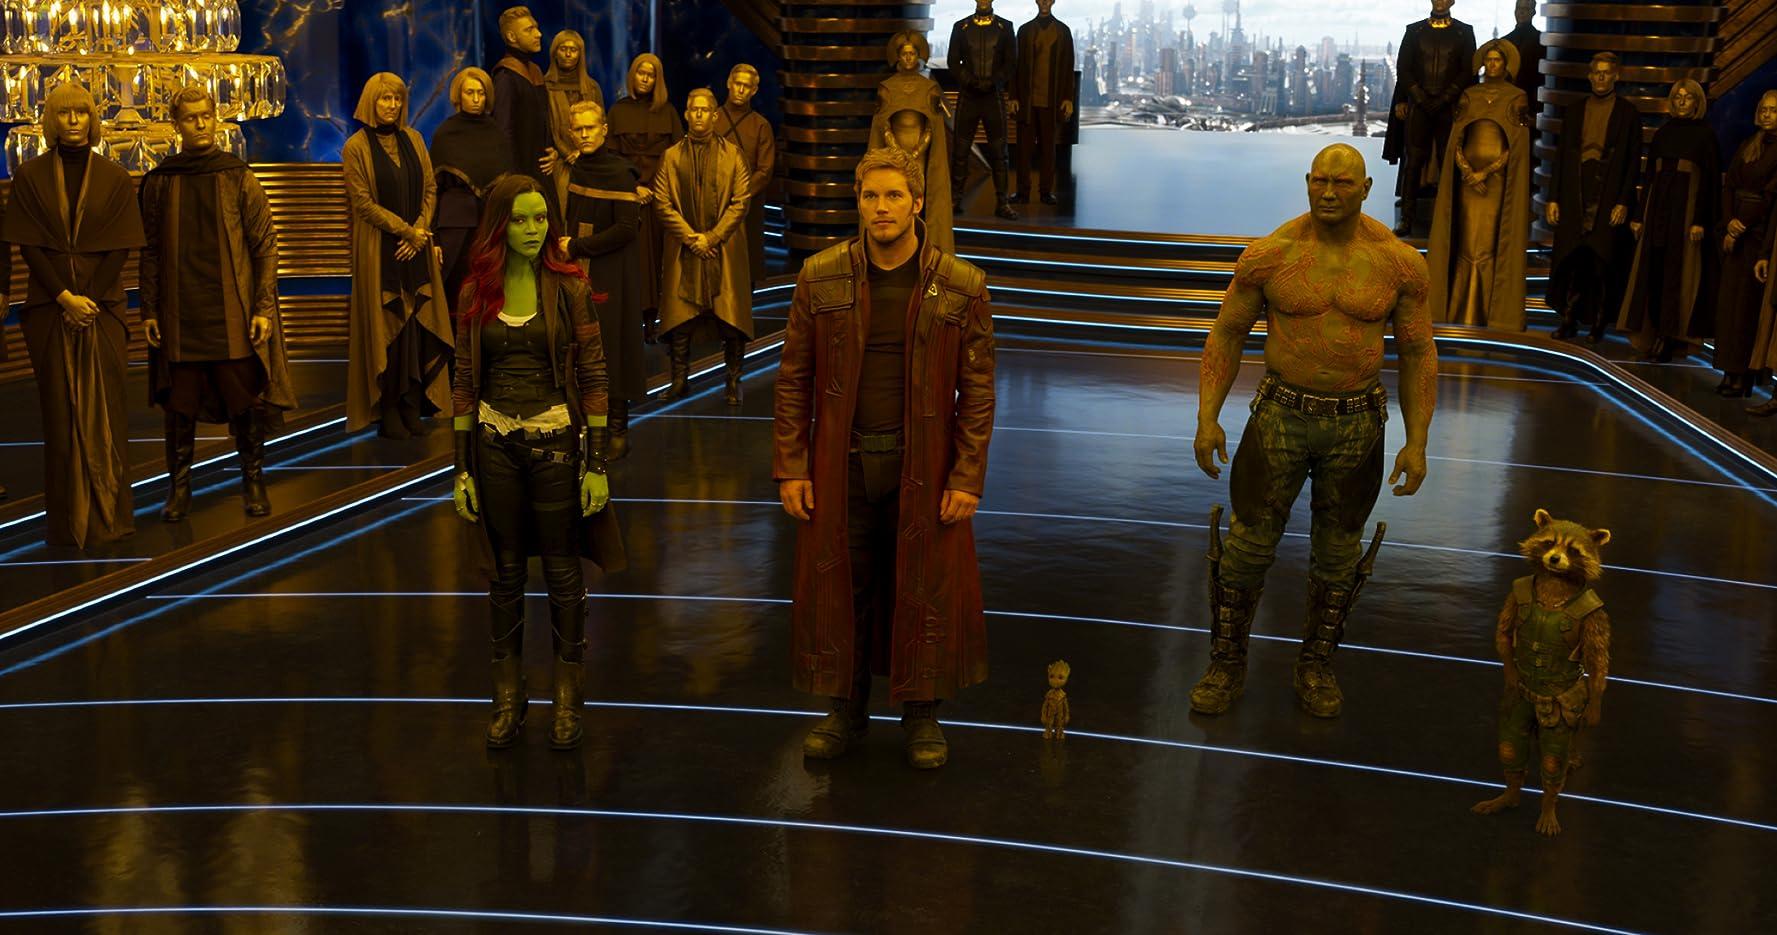 Vin Diesel, Bradley Cooper, Chris Pratt, Zoe Saldana, and Dave Bautista in Guardians of the Galaxy Vol. 2 (2017)